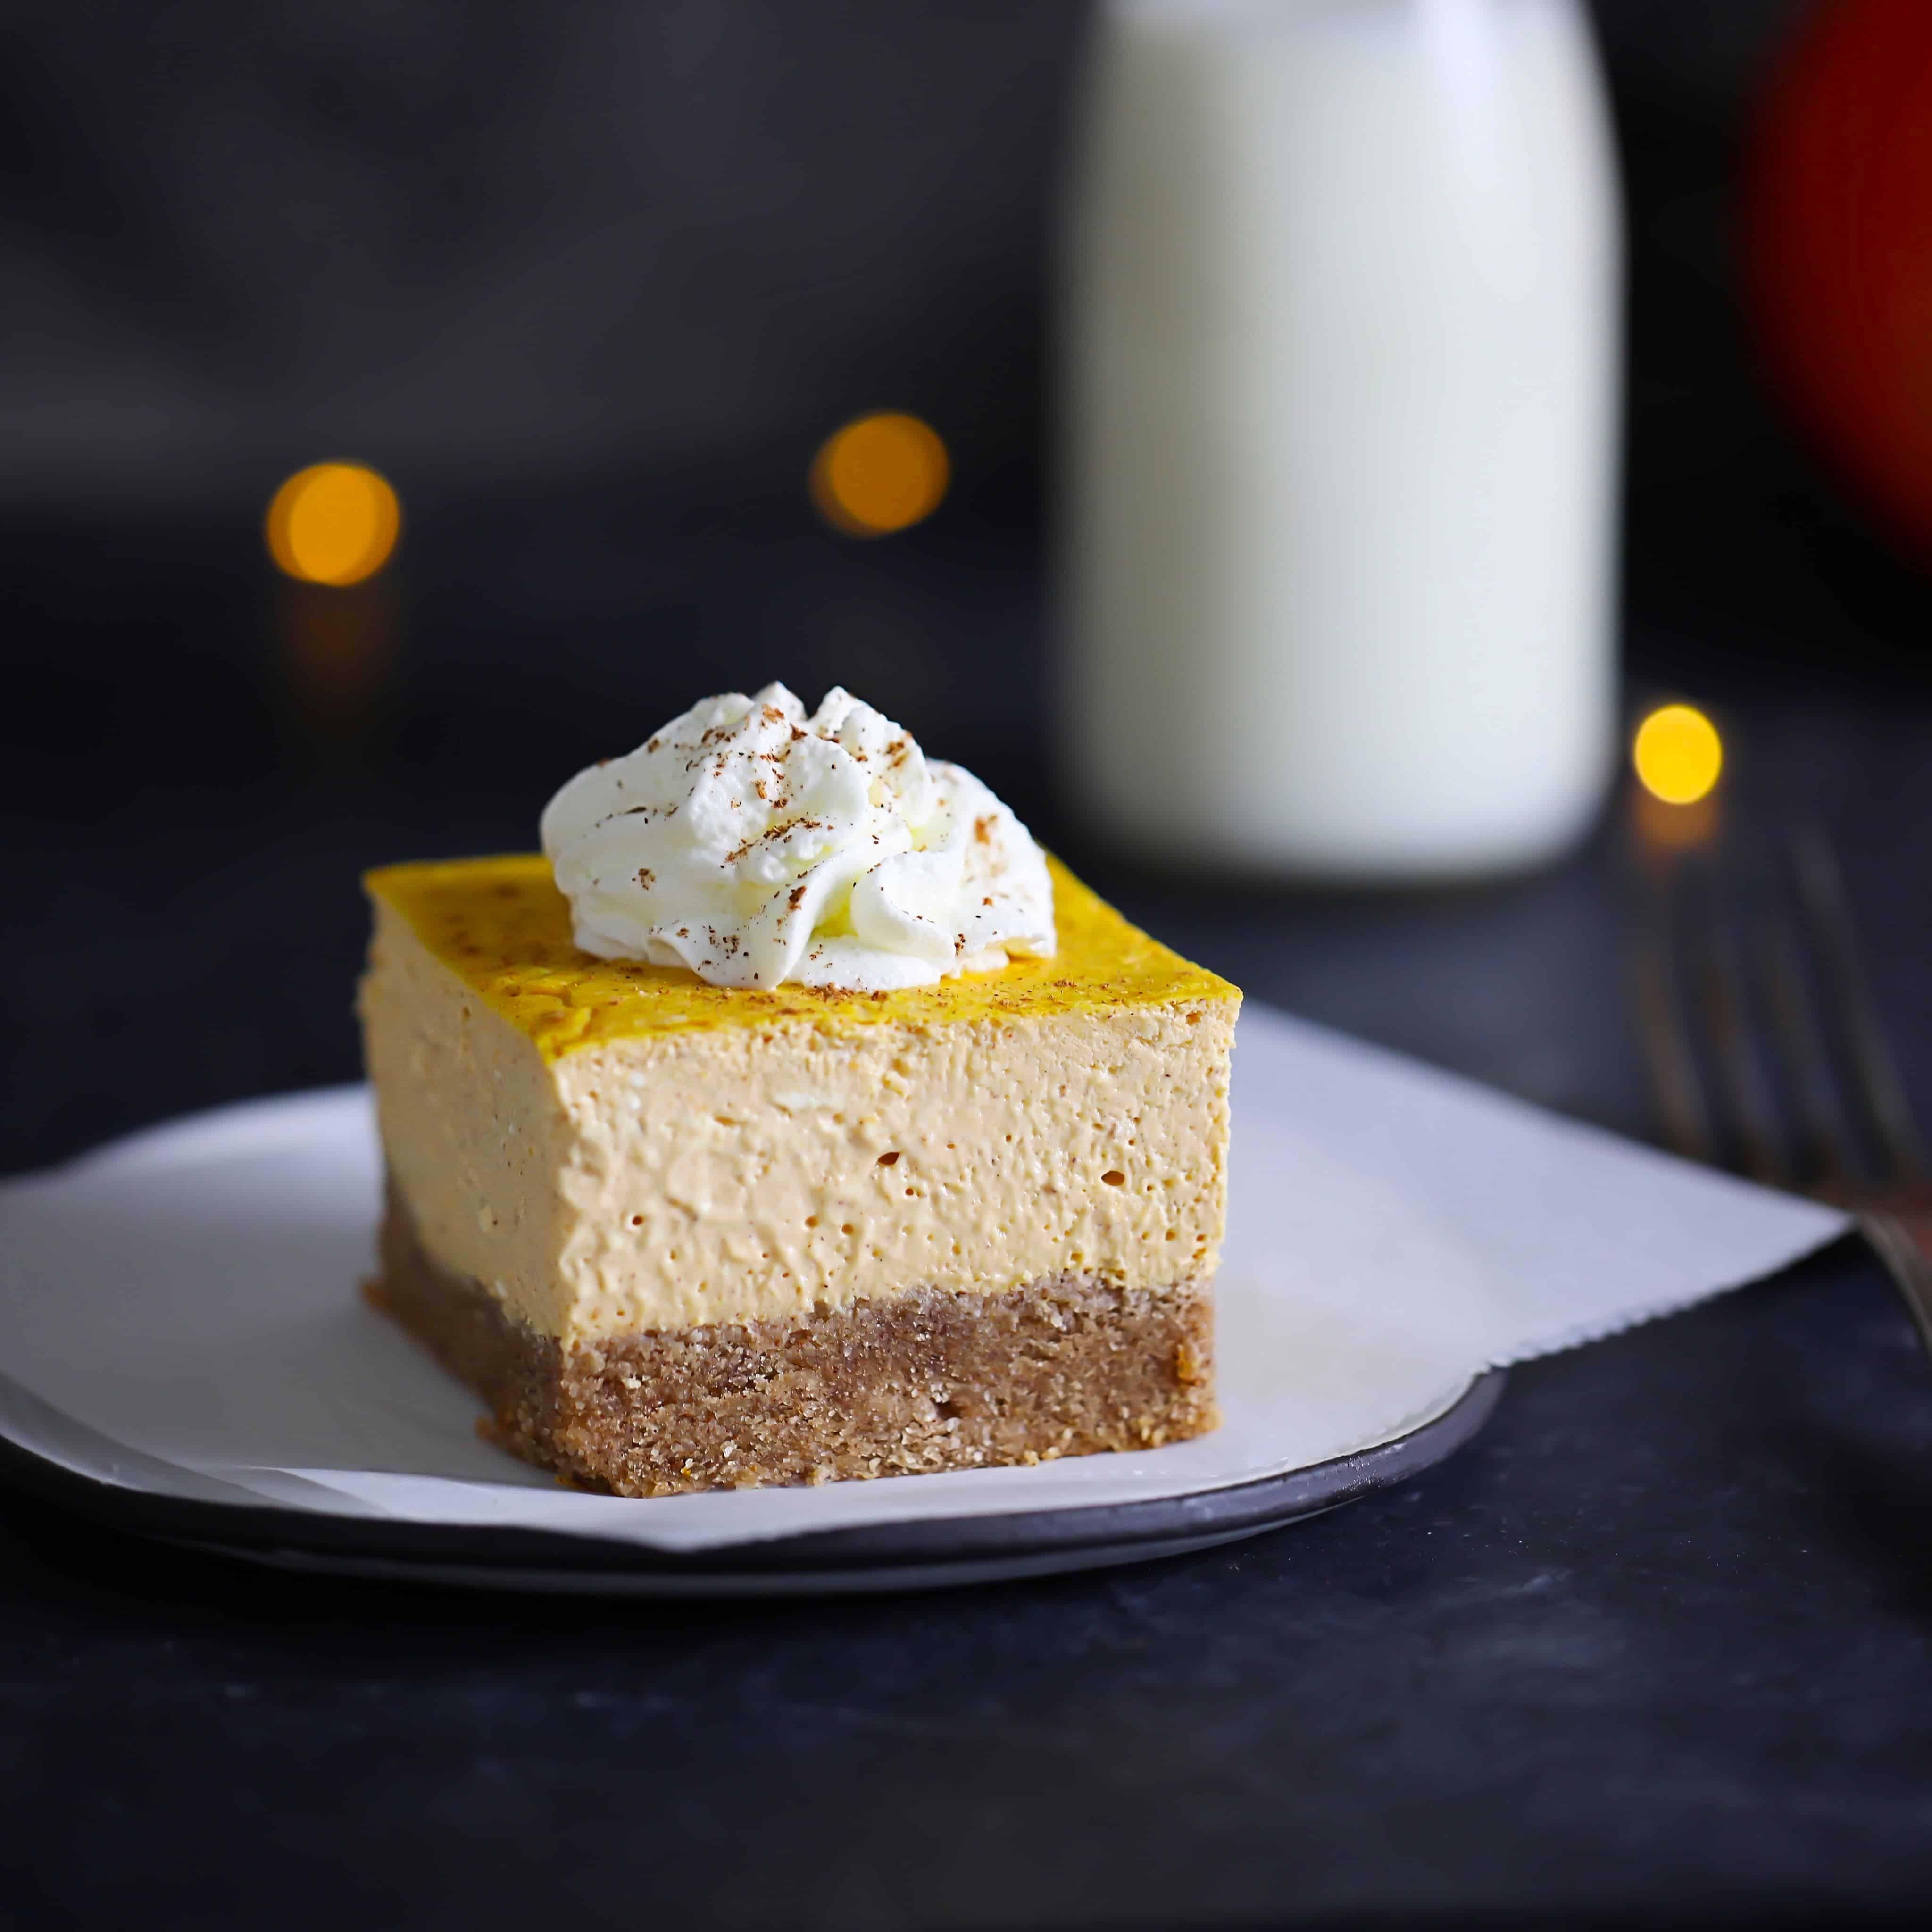 Keto Pumpkin Cheesecake Bars Dreamy Keto/Grain-Free Pumpkin Cheesecake Bars with graham cookie crust!